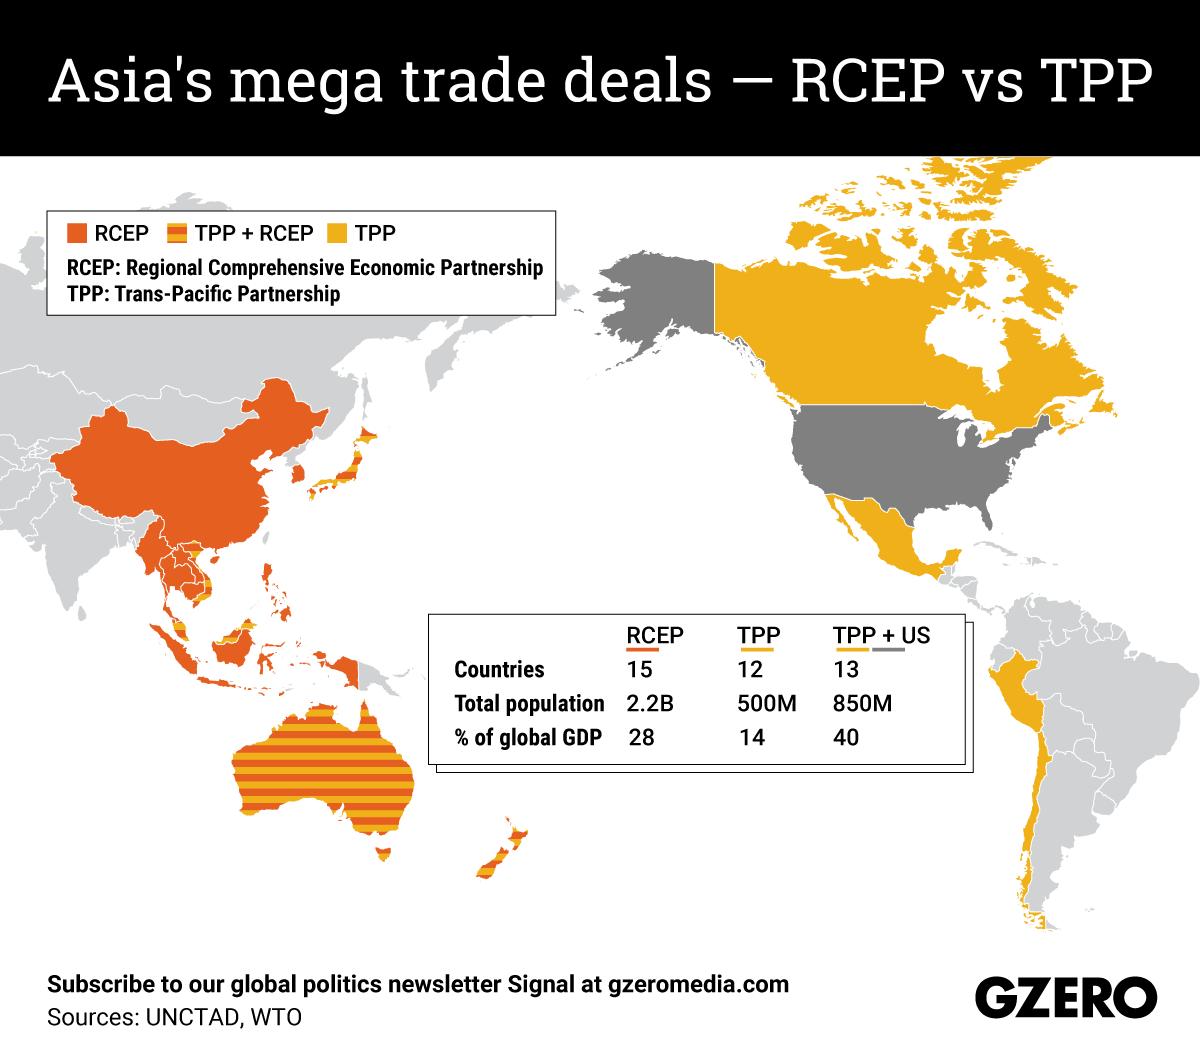 The Graphic Truth: Asia's mega trade deals — RCEP vs TPP